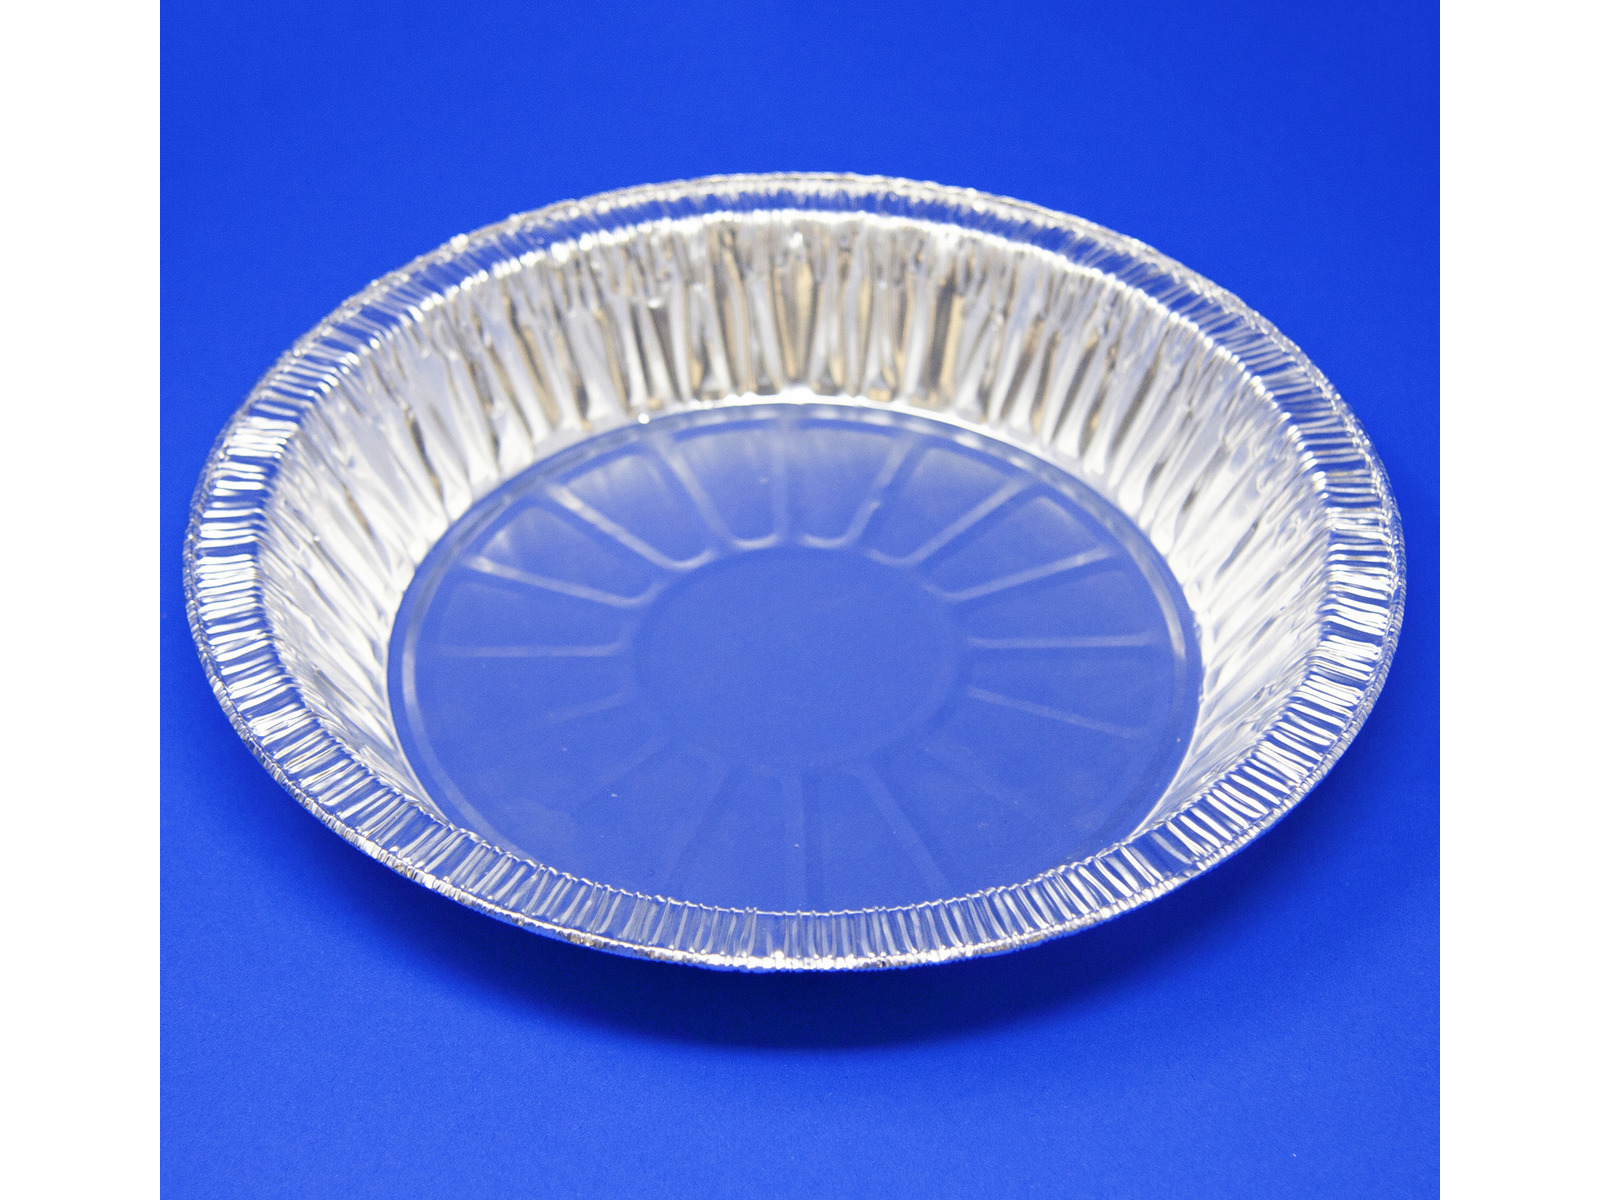 8 inch Pie Plate